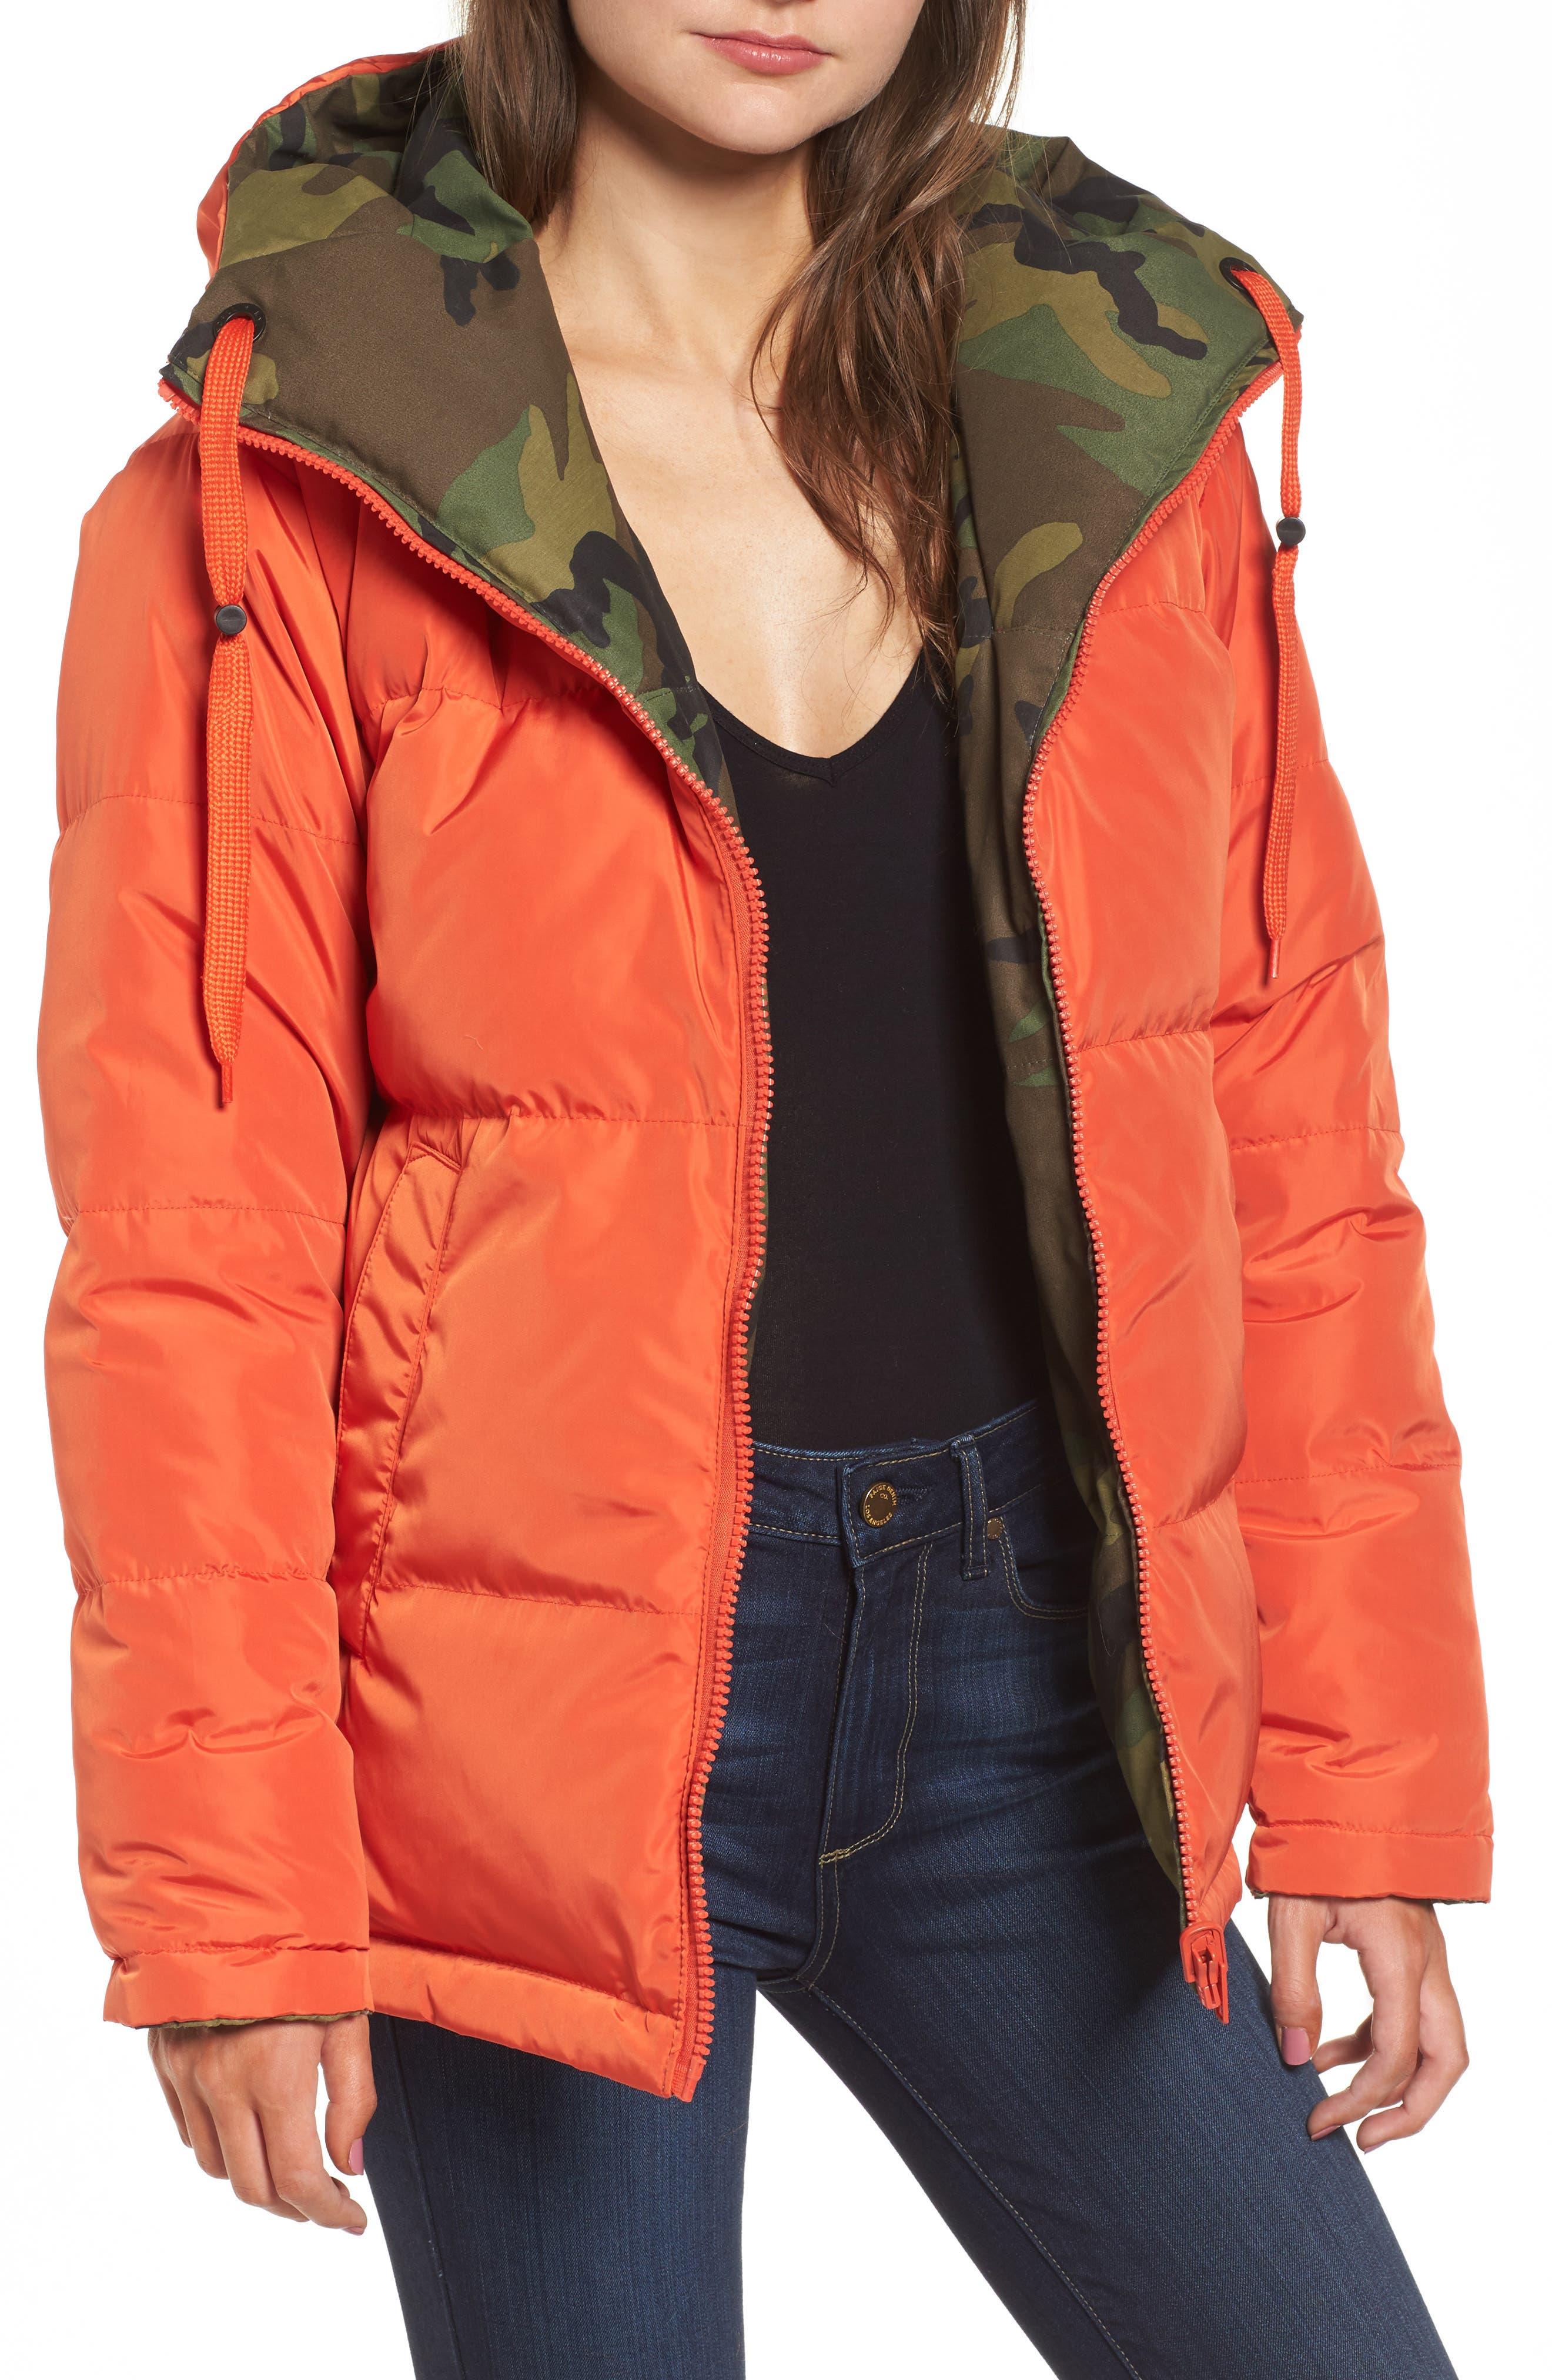 Reversible Puffer Jacket,                             Alternate thumbnail 6, color,                             Camo/ Orange